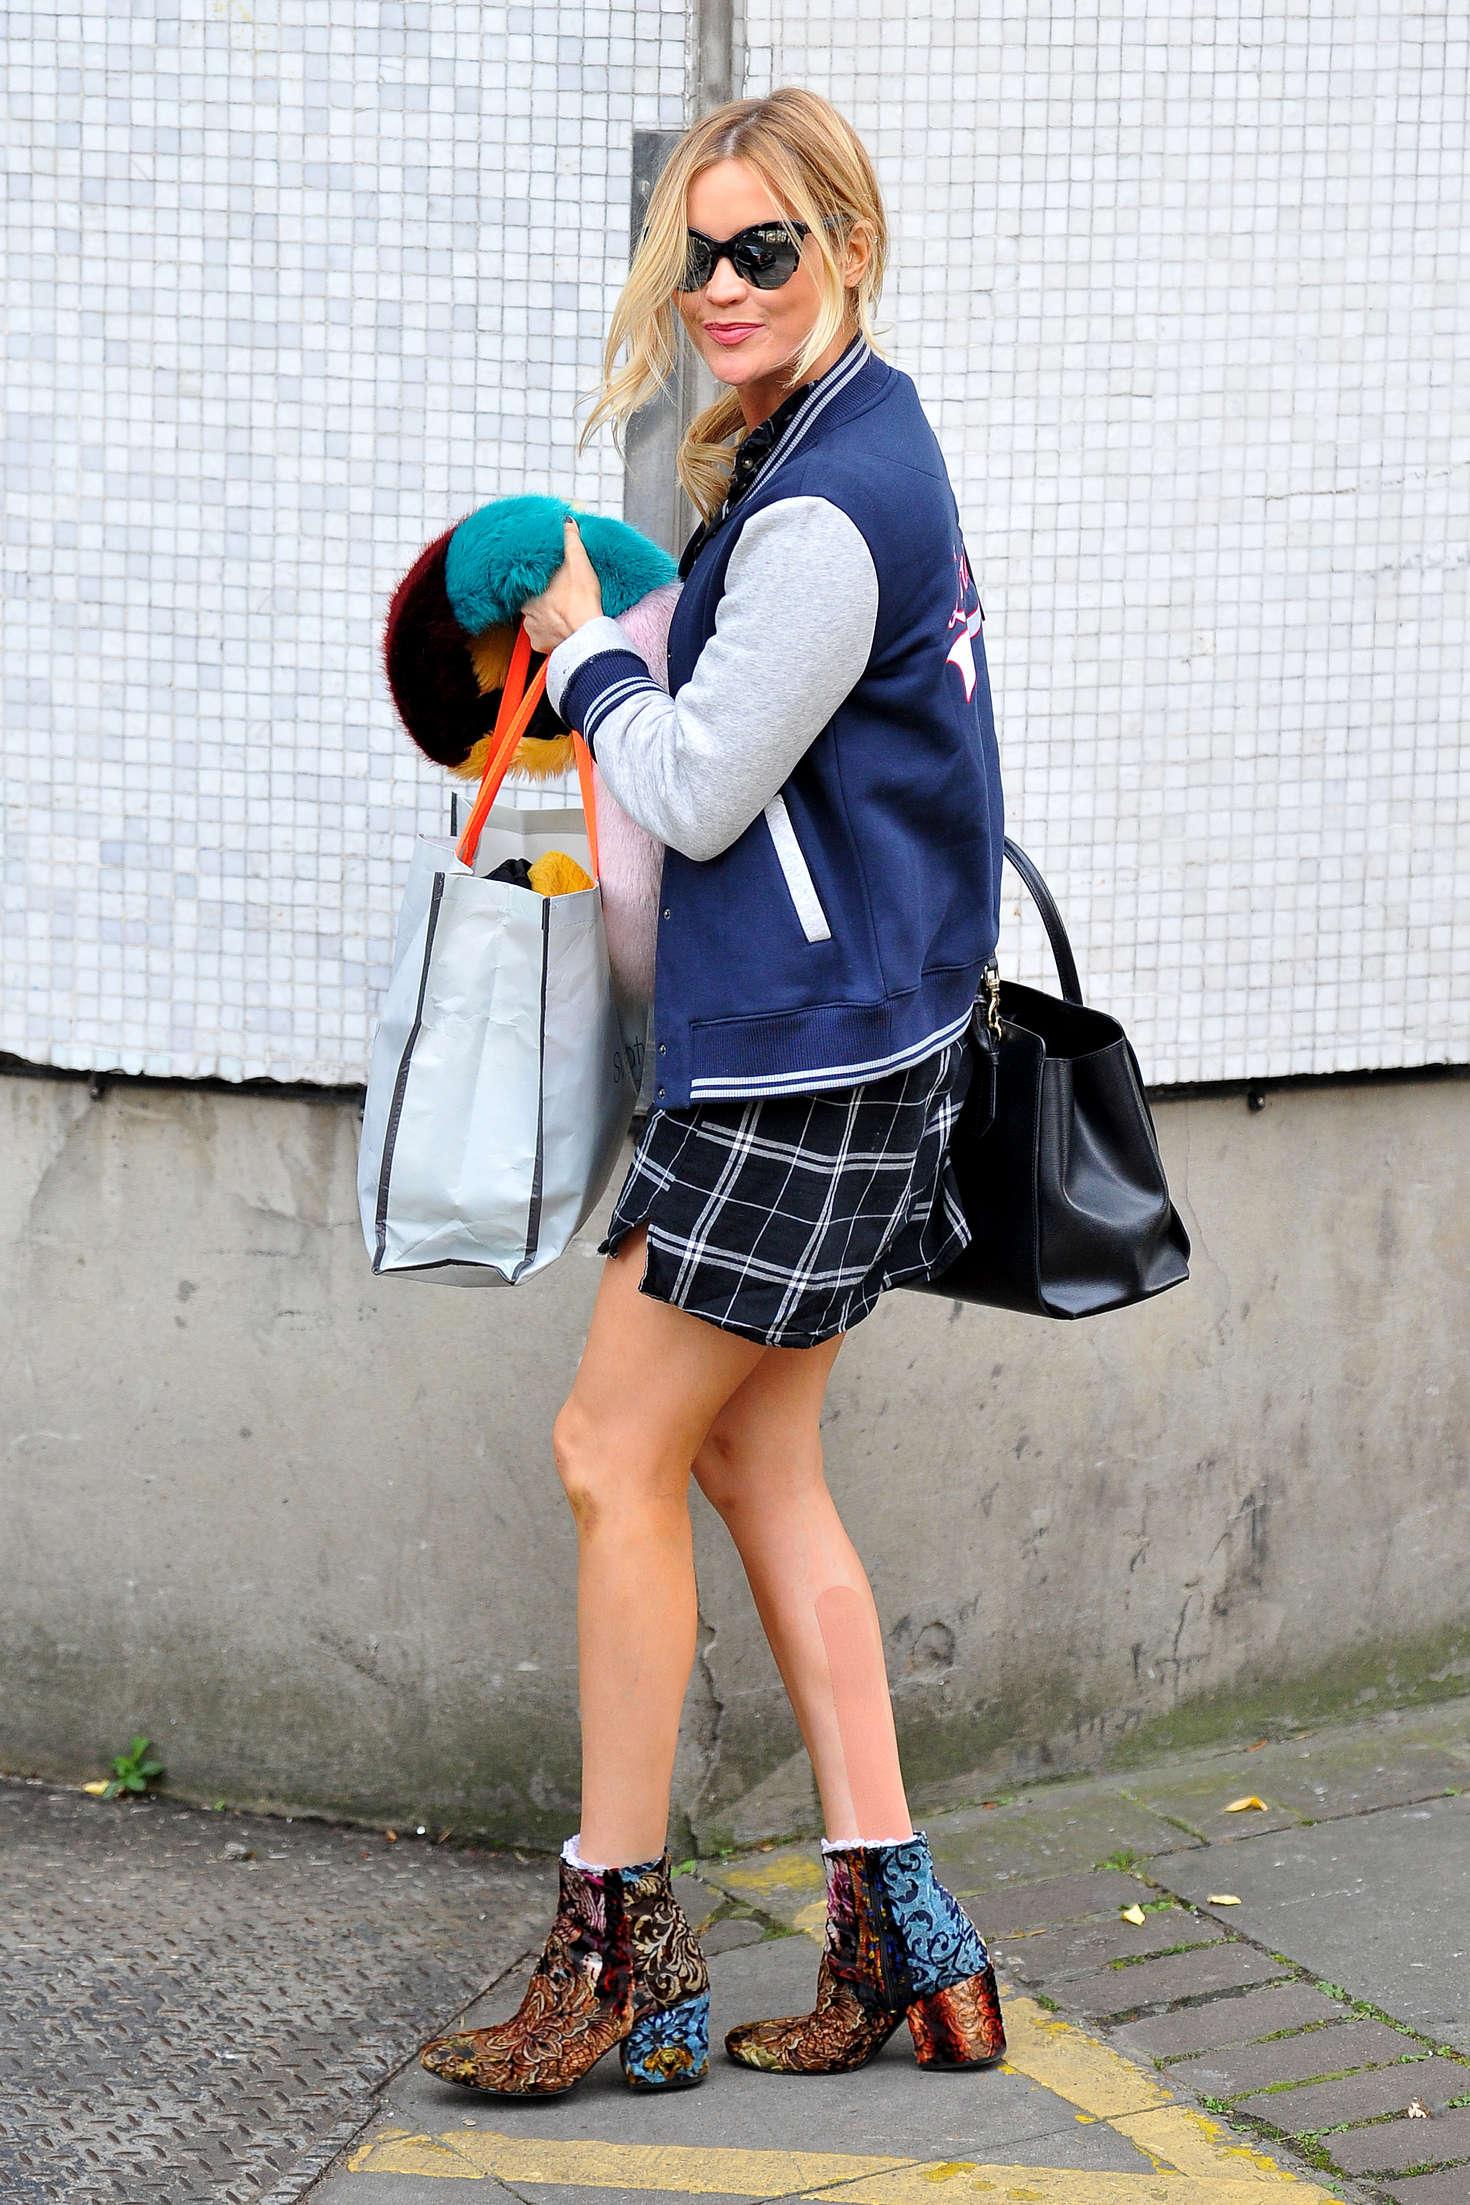 Laura Whitmore in Mini Dress at ITV Studios in London